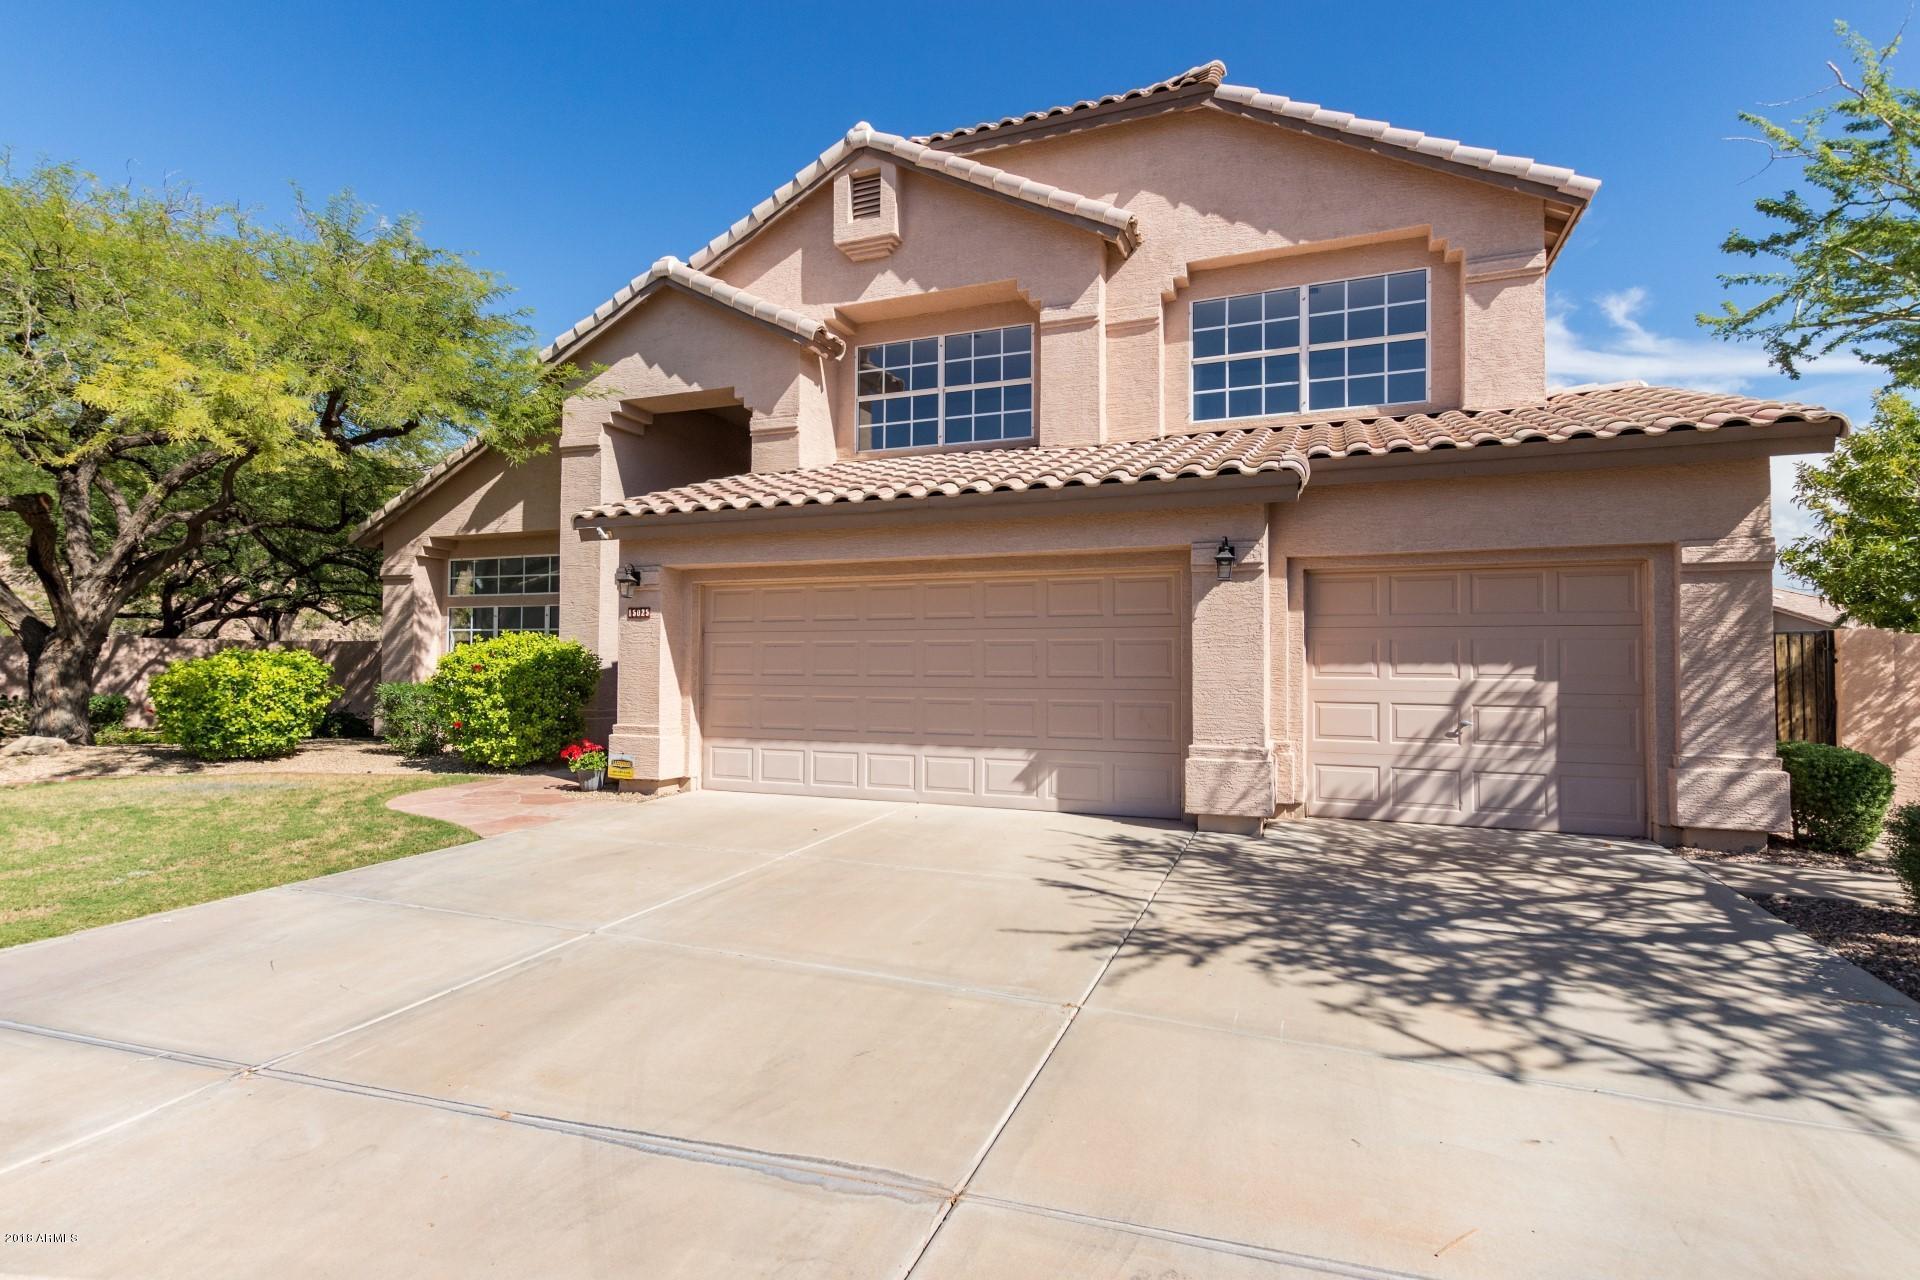 MLS 5837520 15025 S FOXTAIL Lane, Phoenix, AZ 85048 Phoenix AZ Mountain Park Ranch